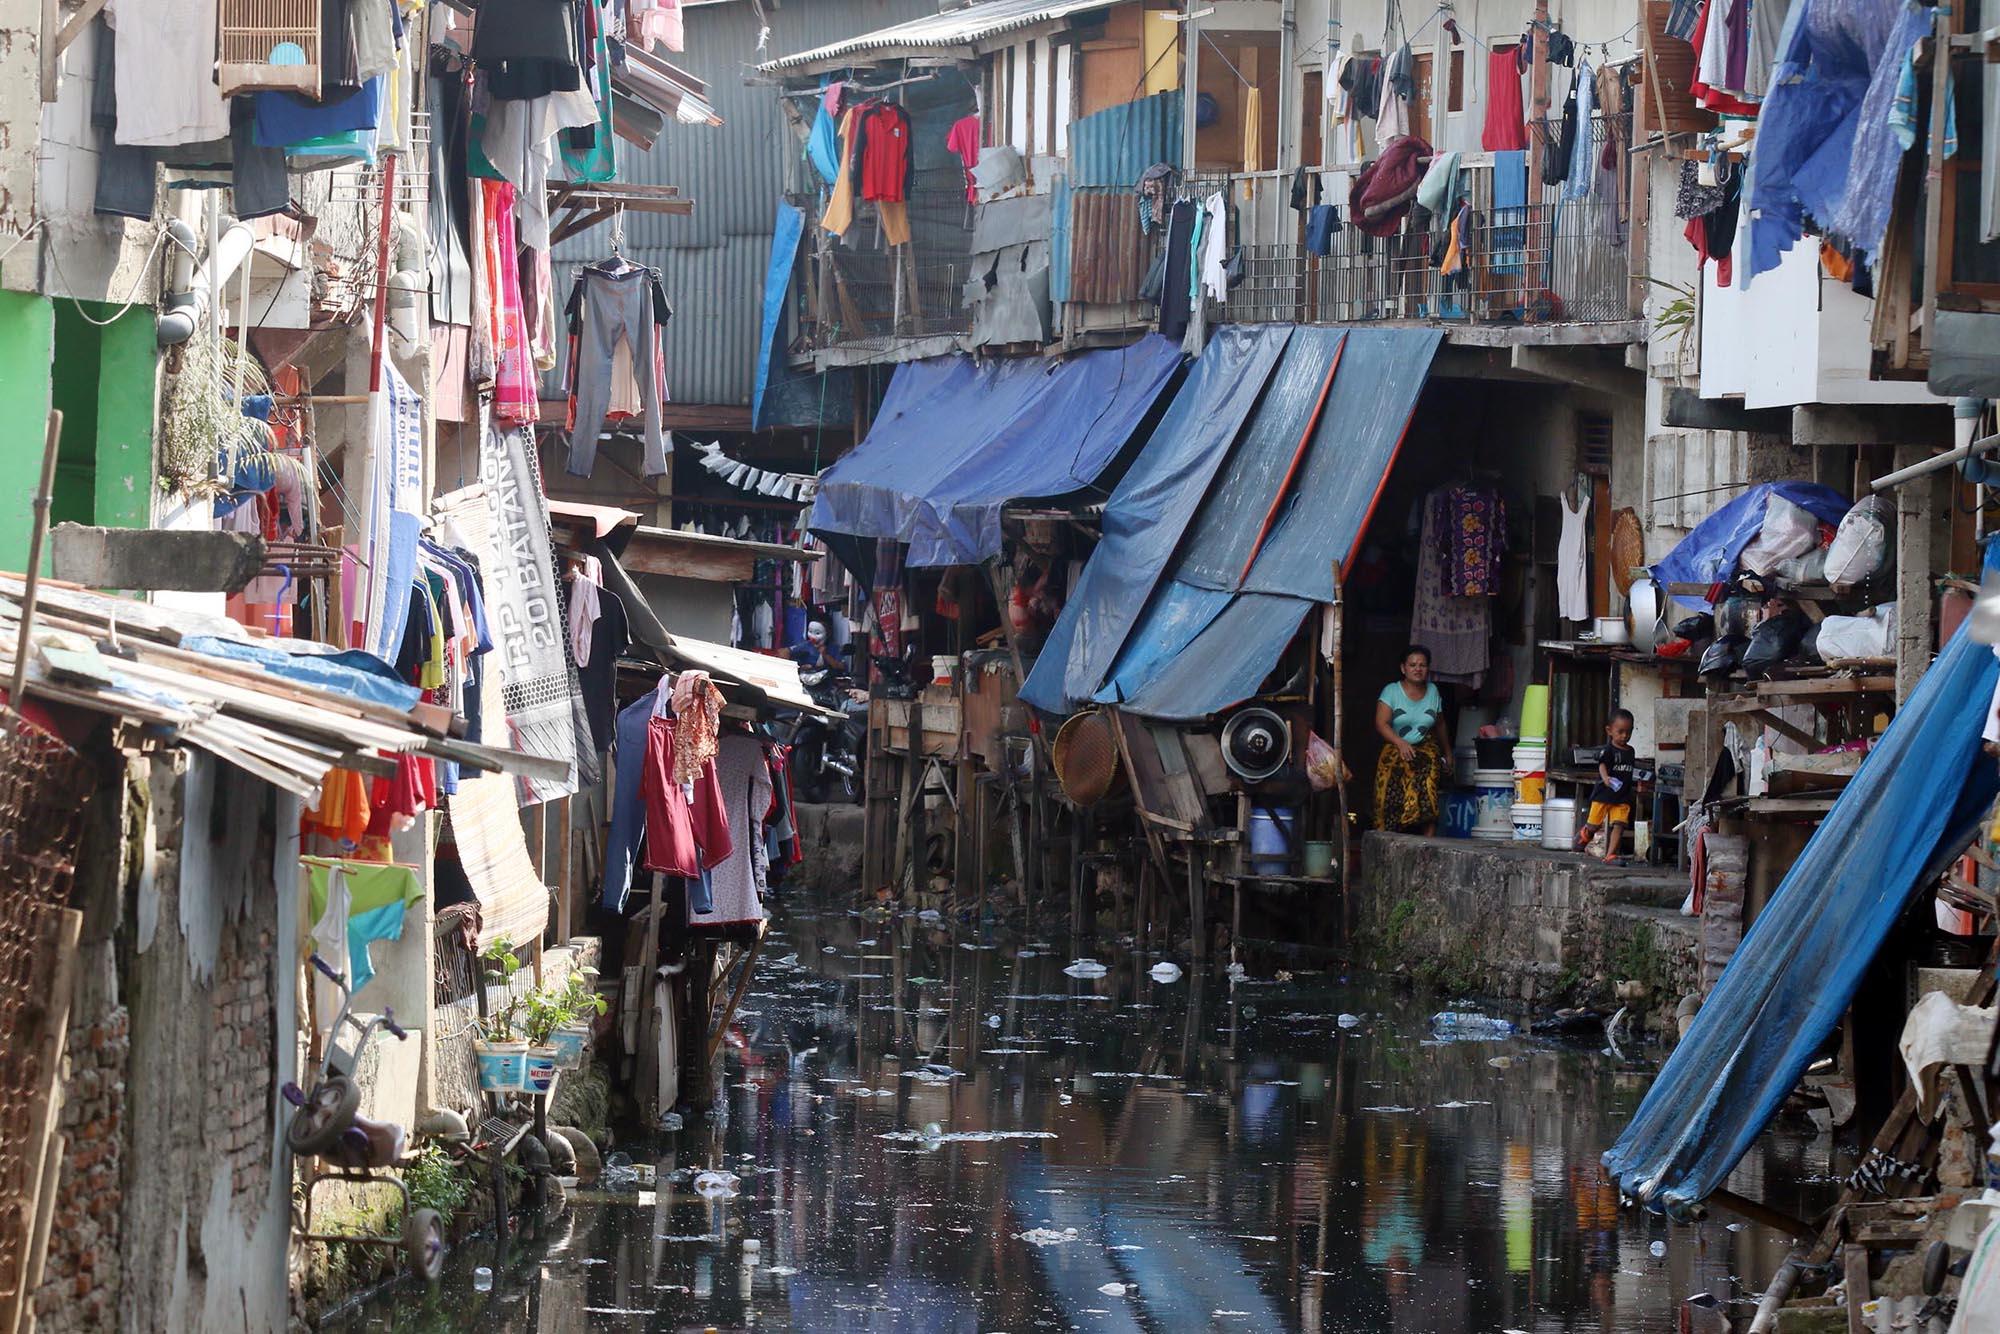 Dihantam Ledakan Kasus COVID-19, Target Ekonomi dalam RPJMN Semakin Sulit Digapai